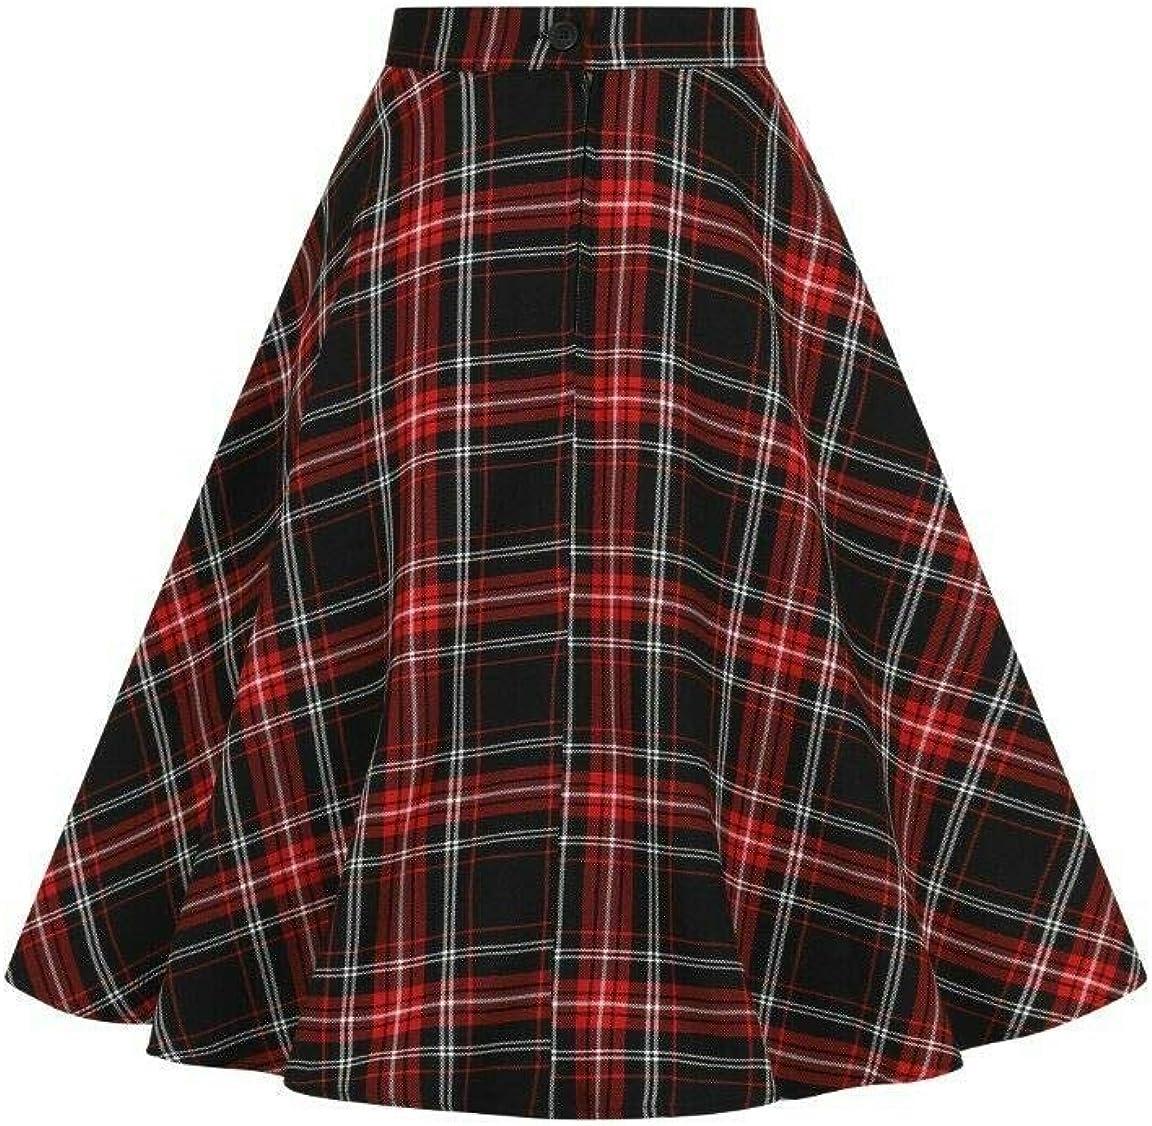 Hell Bunny Islay Checked Tartan 50s Vintage Retro Rockabilly Flare Skirt Red